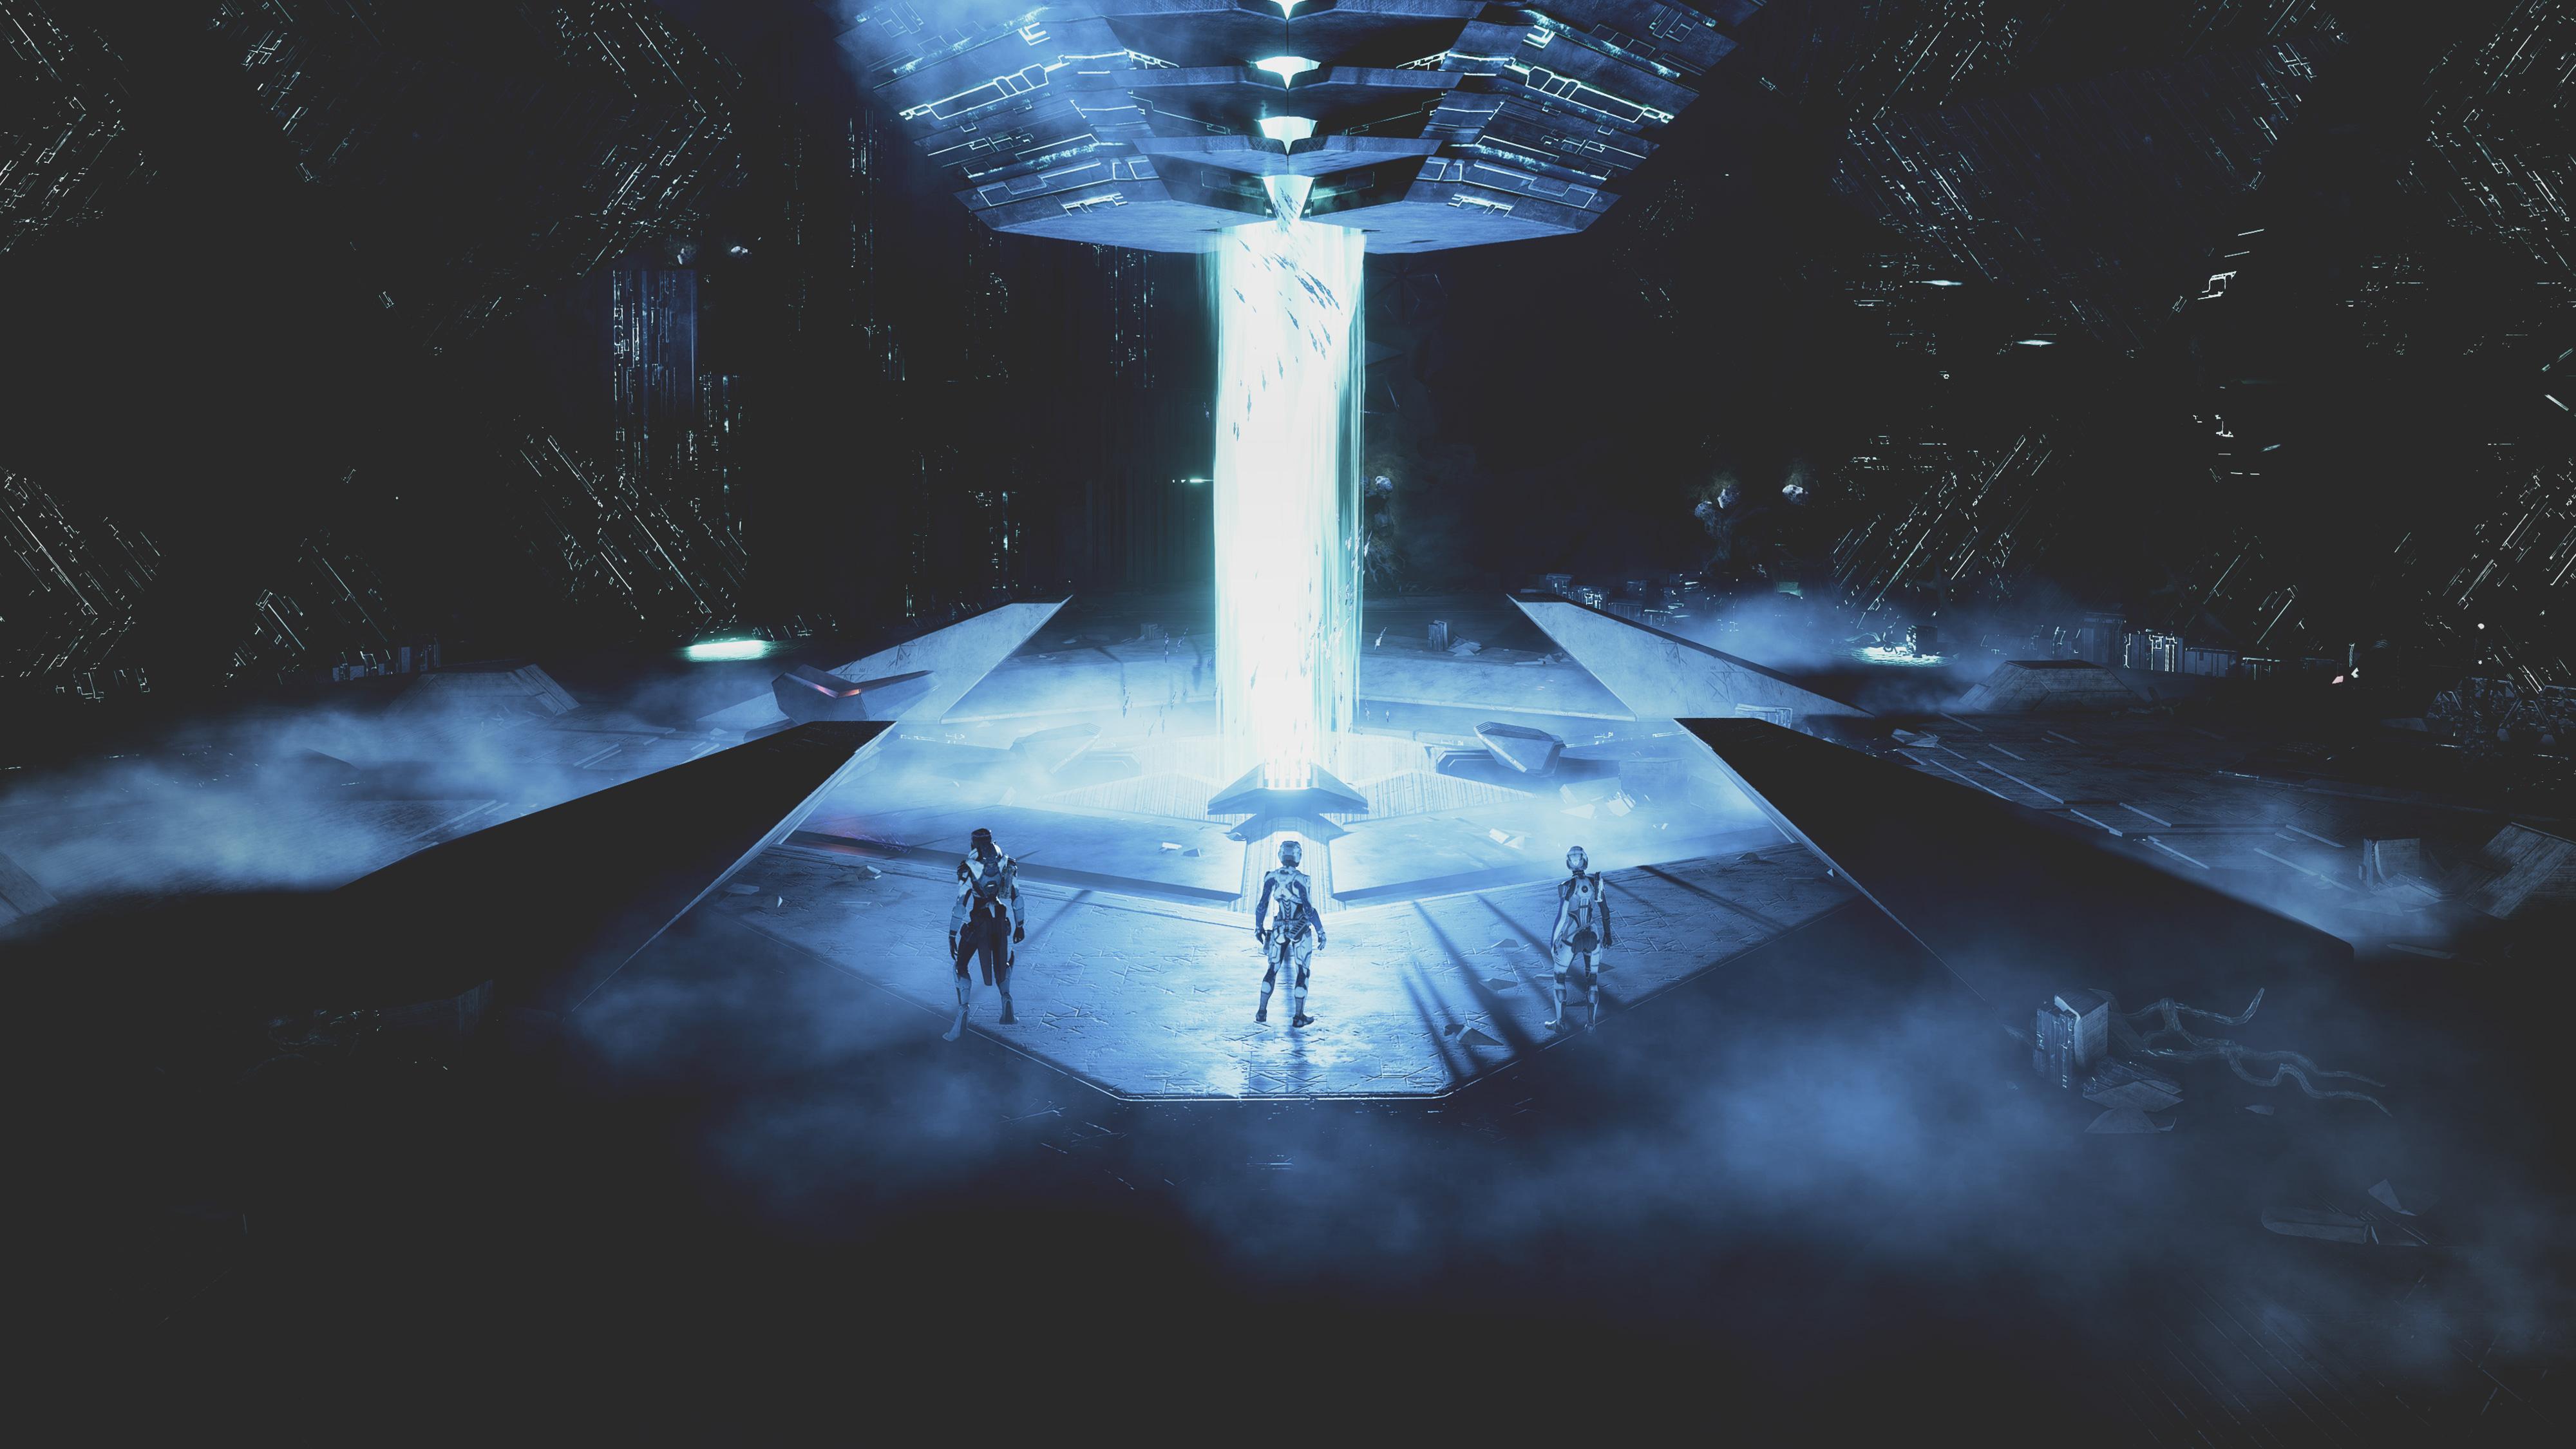 Mass Effect Andromeda Full Hd 3d Wallpapers: 4k Mass Effect Andromeda 2018, HD Games, 4k Wallpapers